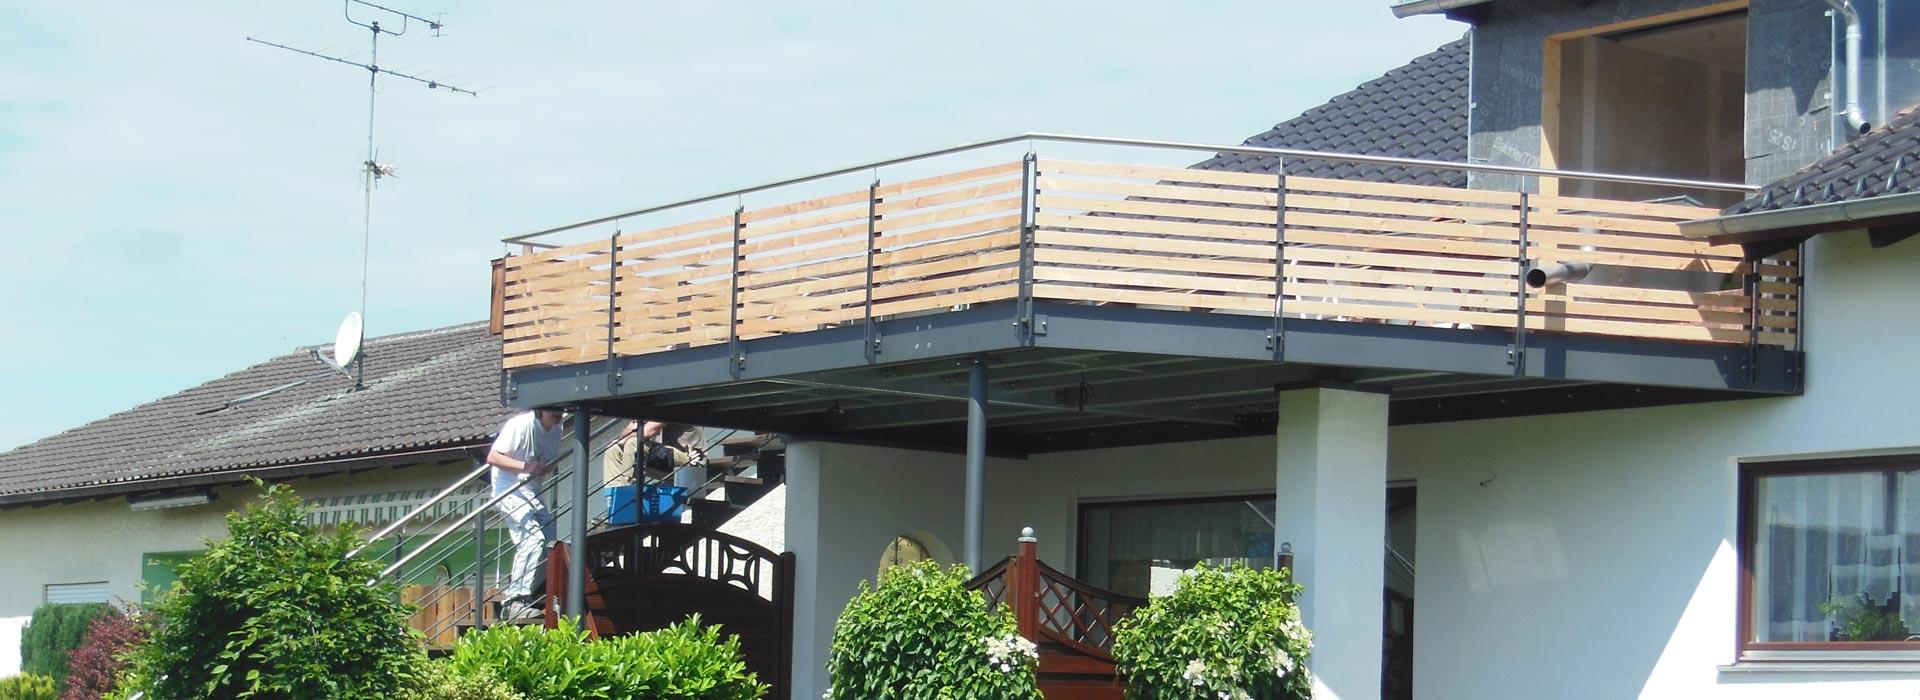 Stahlbau bei Balkon